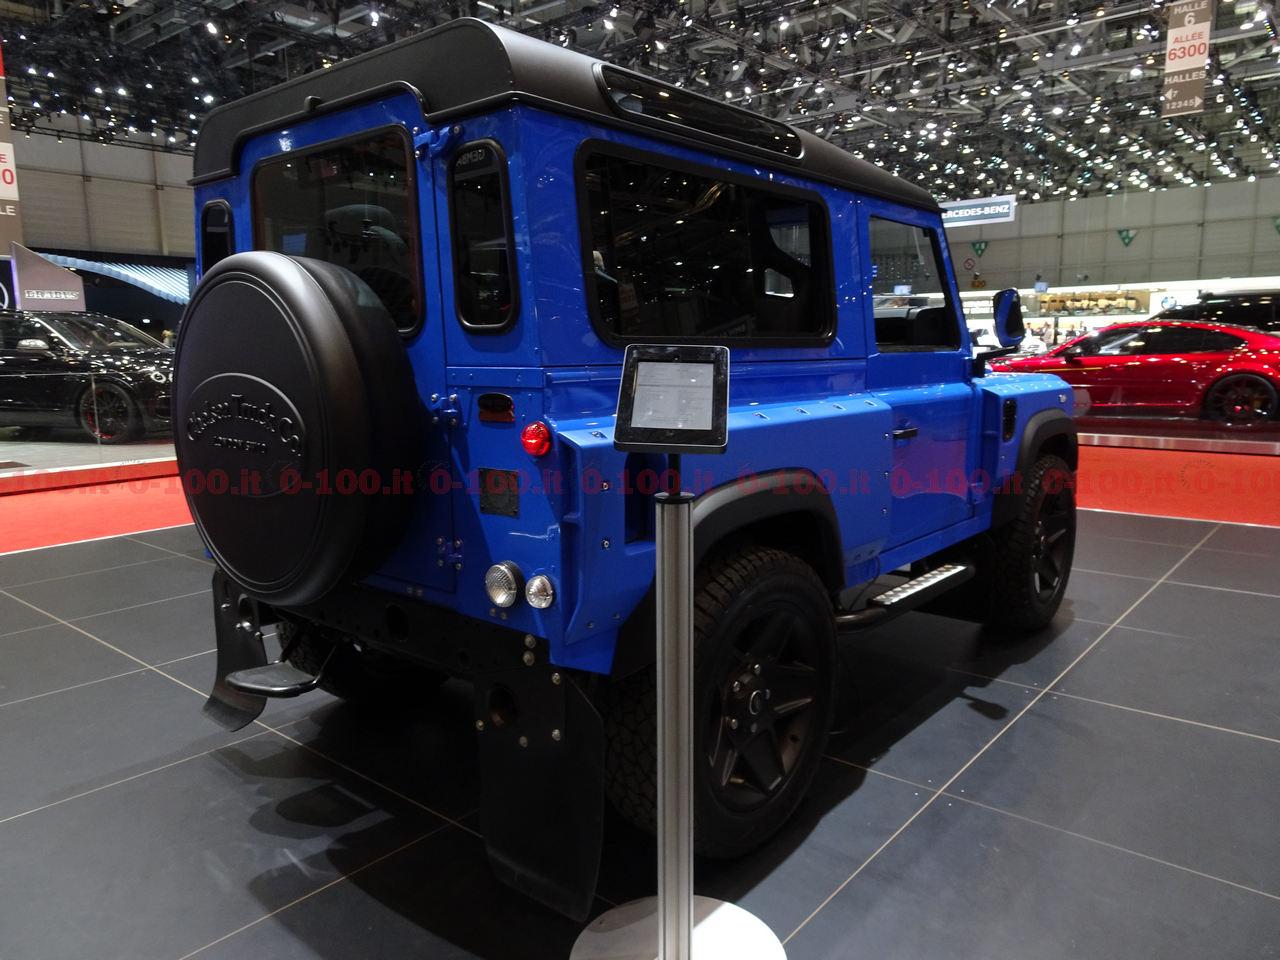 Geneve-ginevra-geneva-2017_tuning-khan-design-chelsea-truck-land-rover-defender_0-100_2